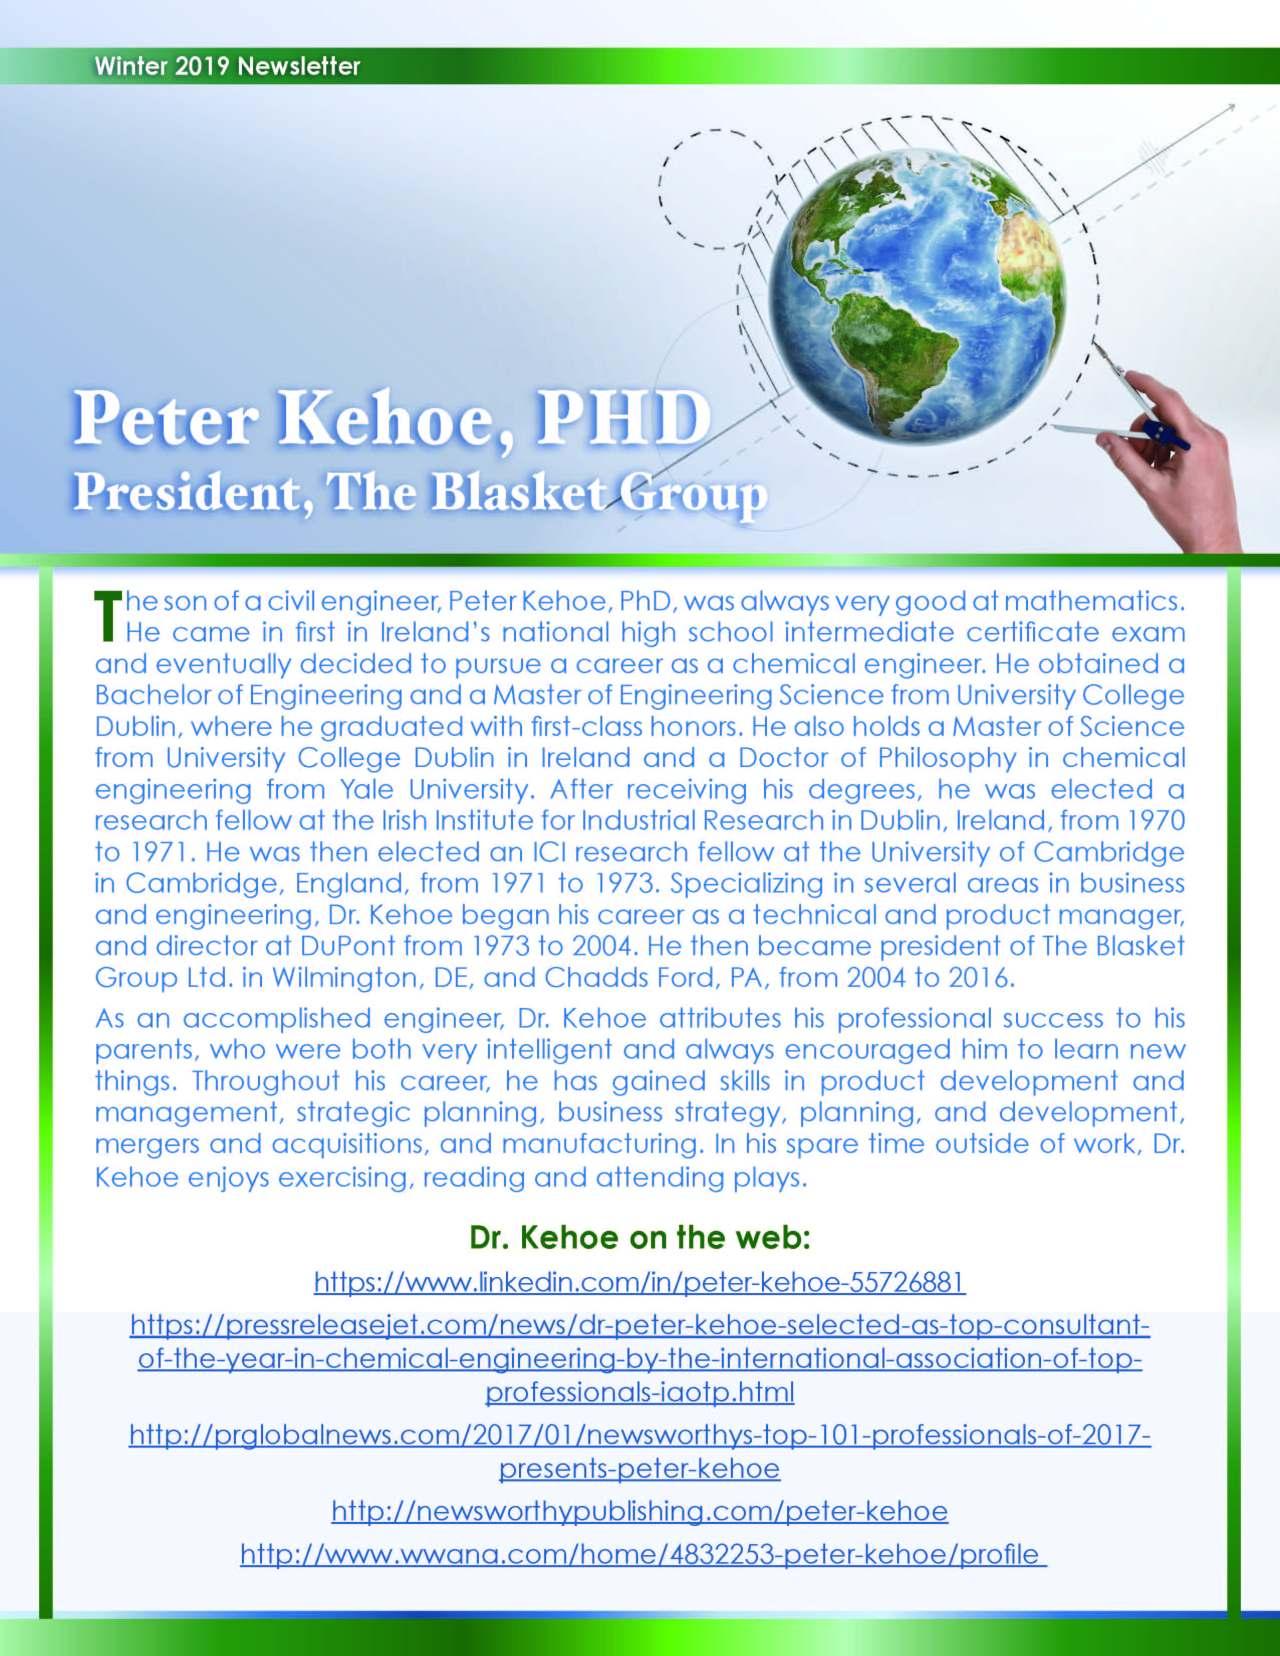 Kehoe, Peter 3875489_4003875489 Newsletter REVISED.jpg